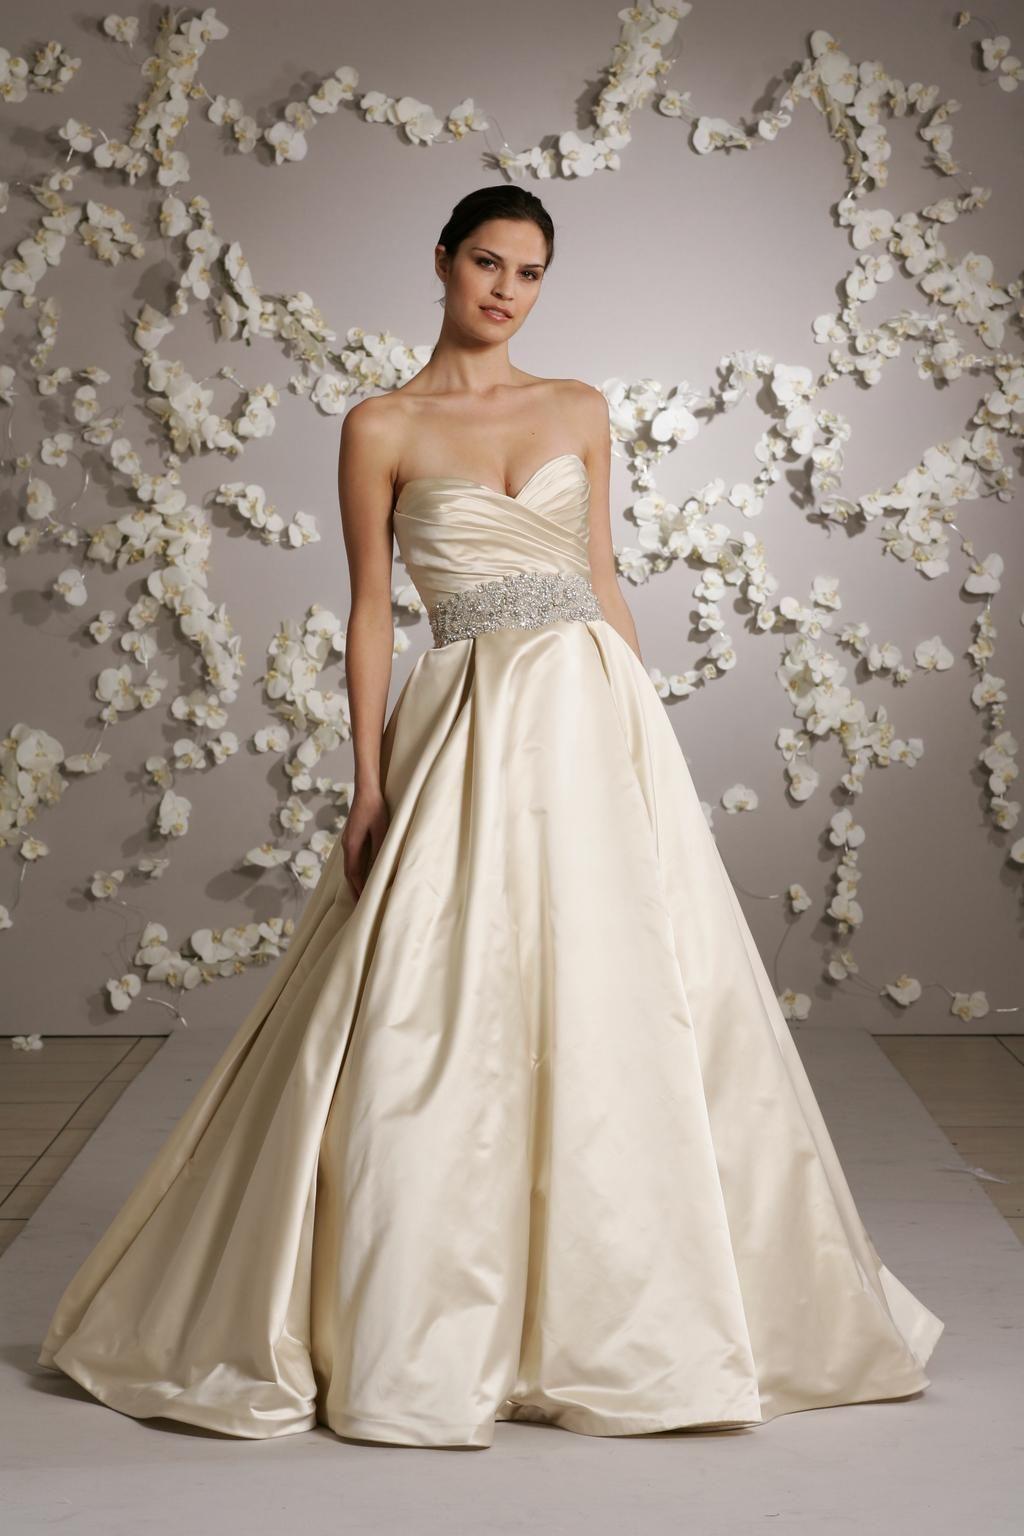 Lazaro 3018 2 250 Size 28 New Un Altered Wedding Dresses Lazaro Wedding Dress Ball Gowns Wedding Ball Gown Wedding Dress